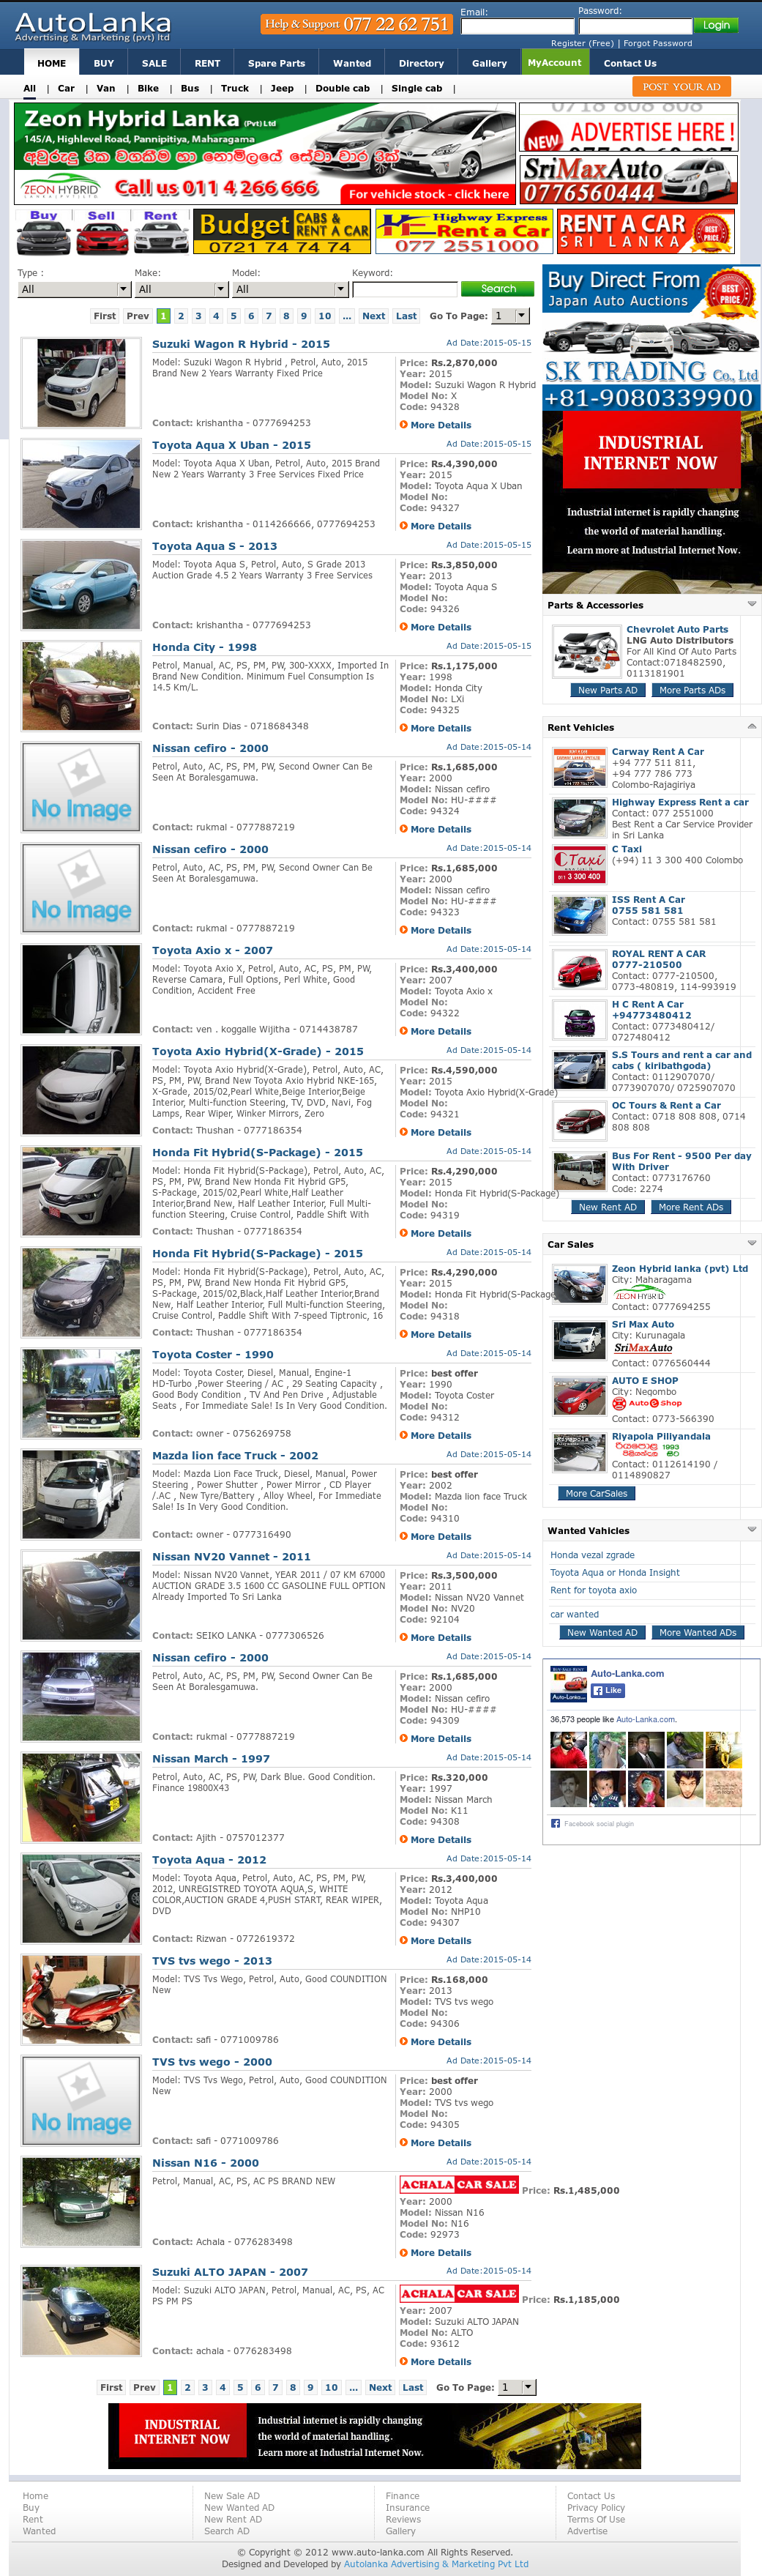 Auto-lanka Competitors, Revenue and Employees - Owler